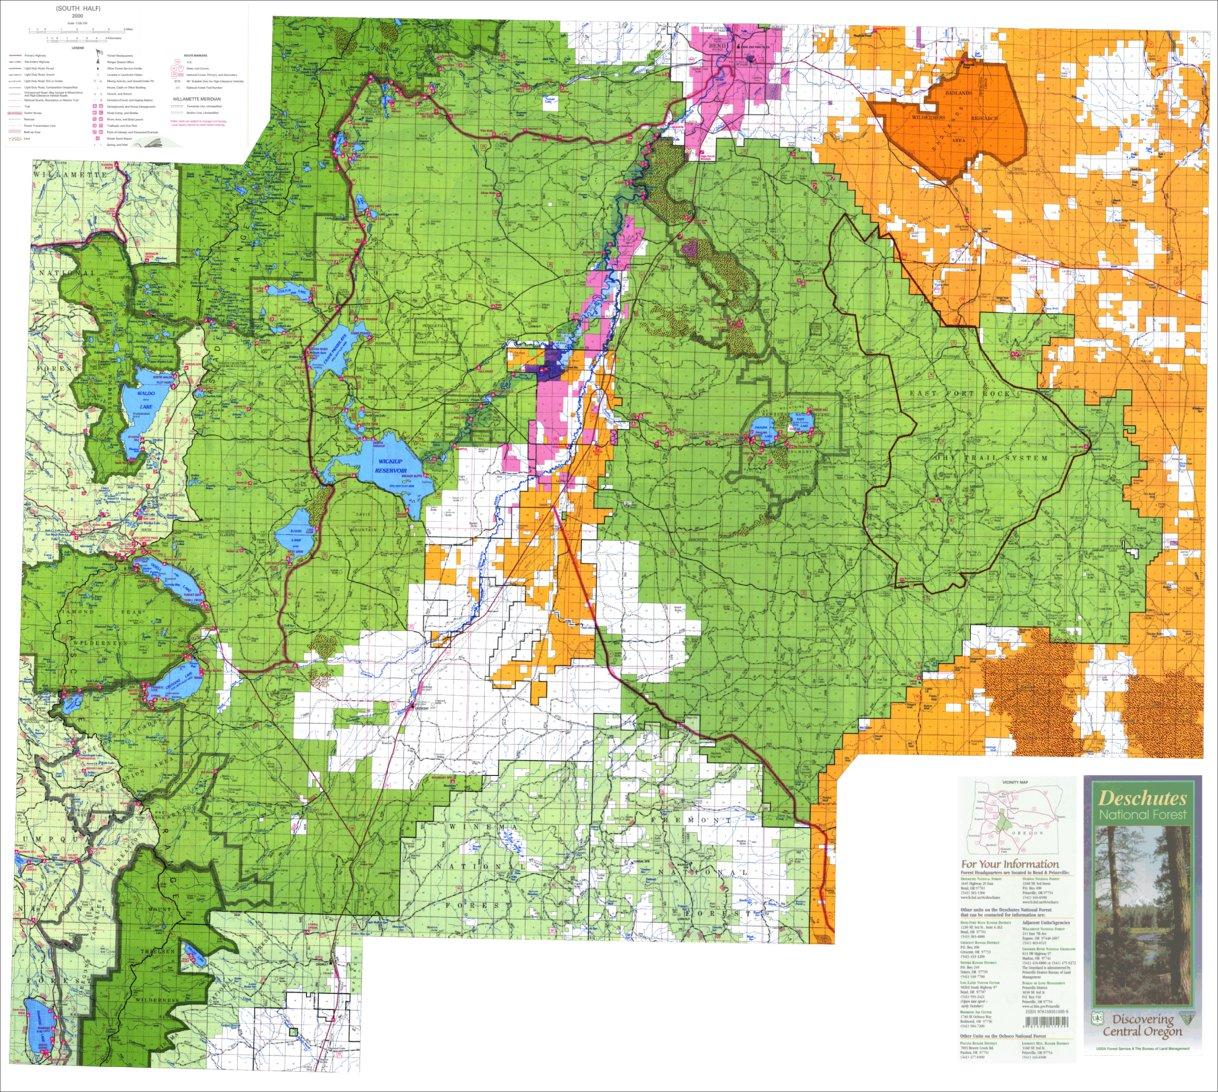 on deschutes national forest map